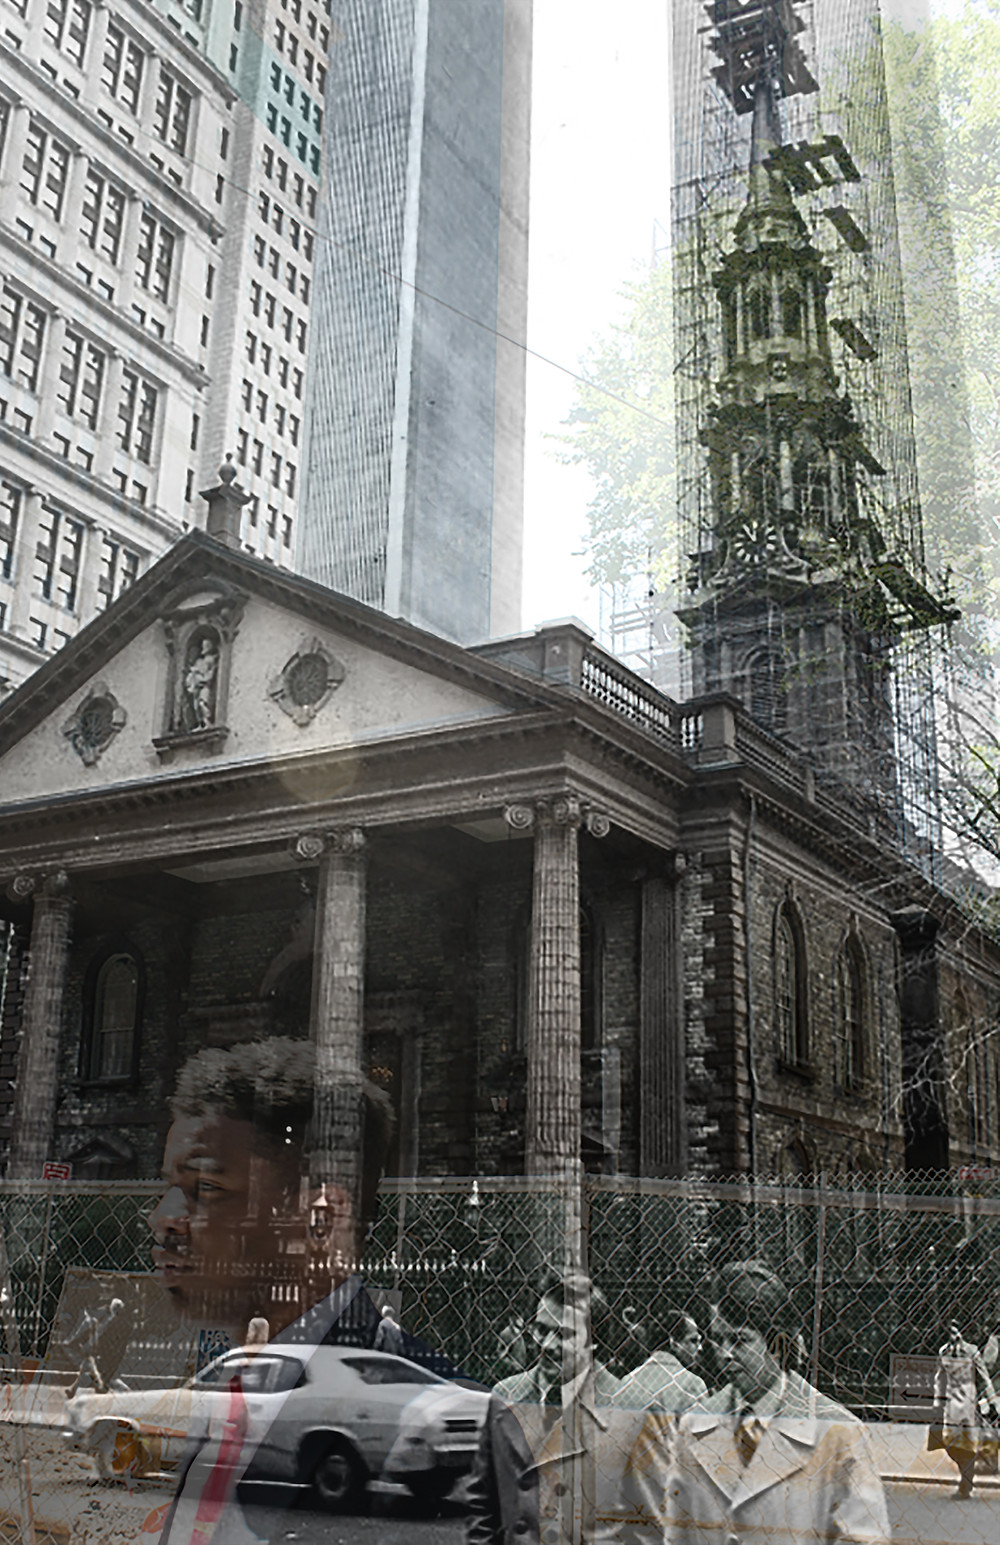 St. Paul's Chapel, New York City, New York